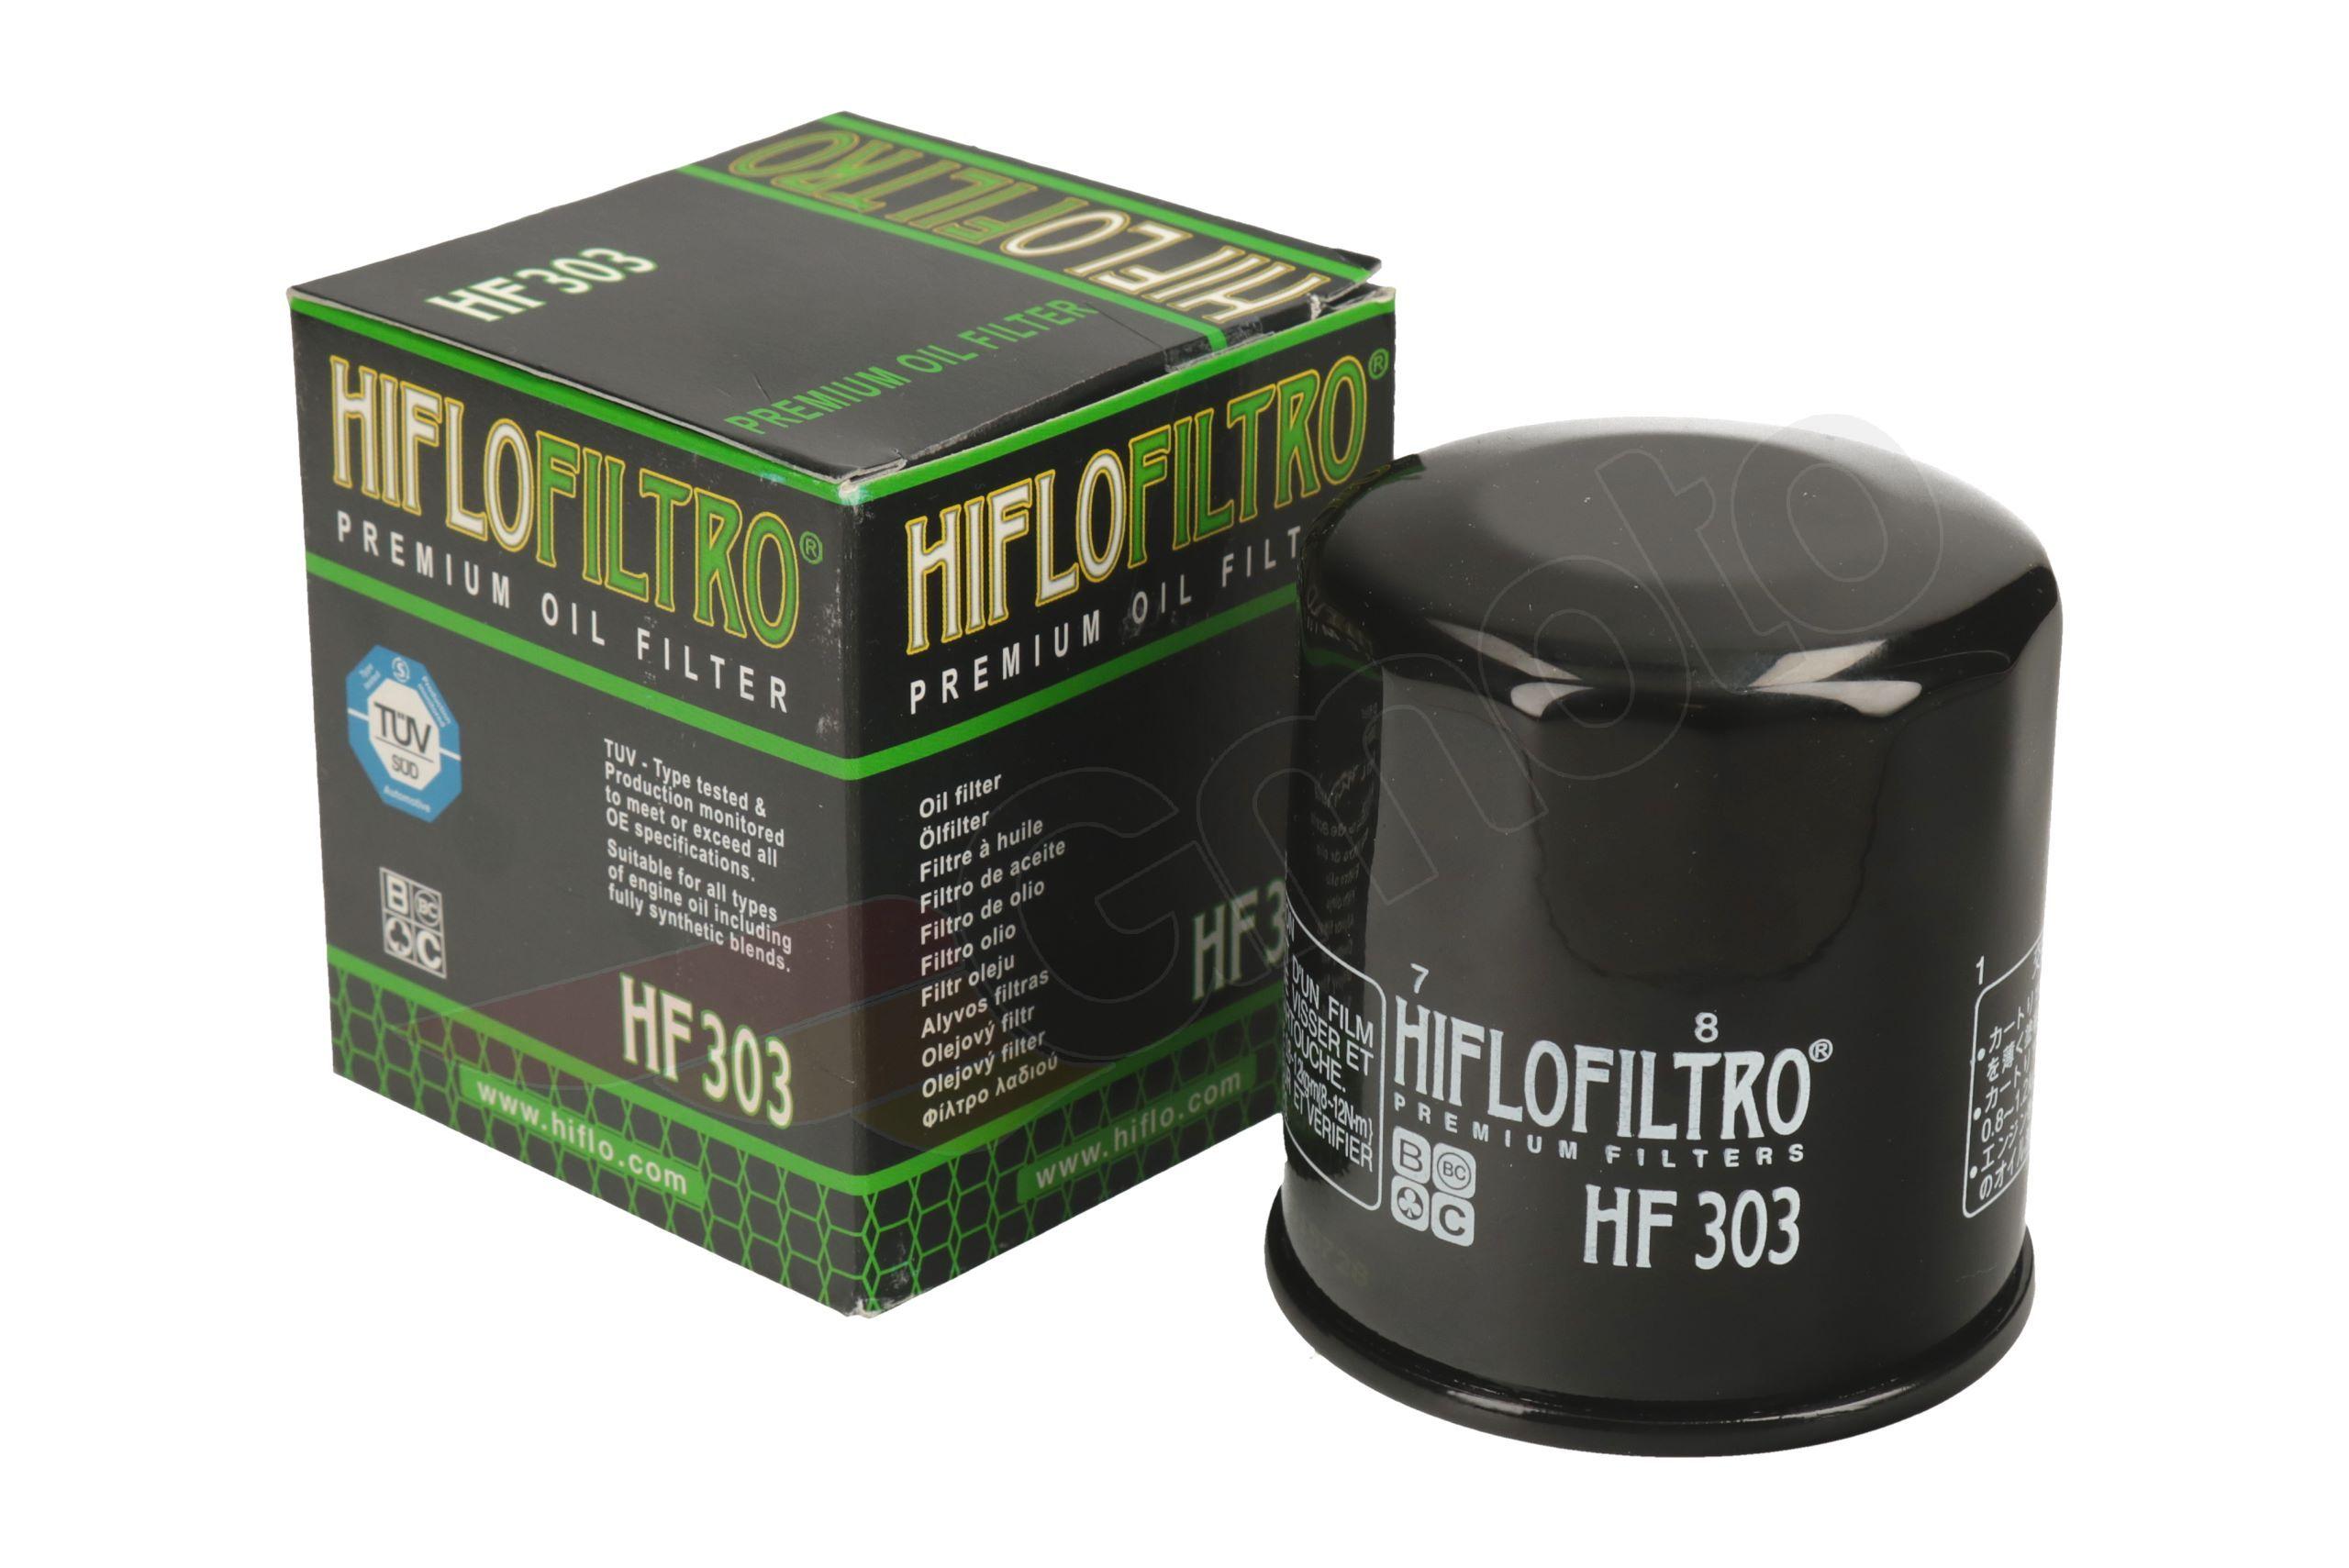 Hiflofiltro filtro aceite hf303 yamaha yxr 450 660 Rhino Hiflo filtro filtro aceite de motor